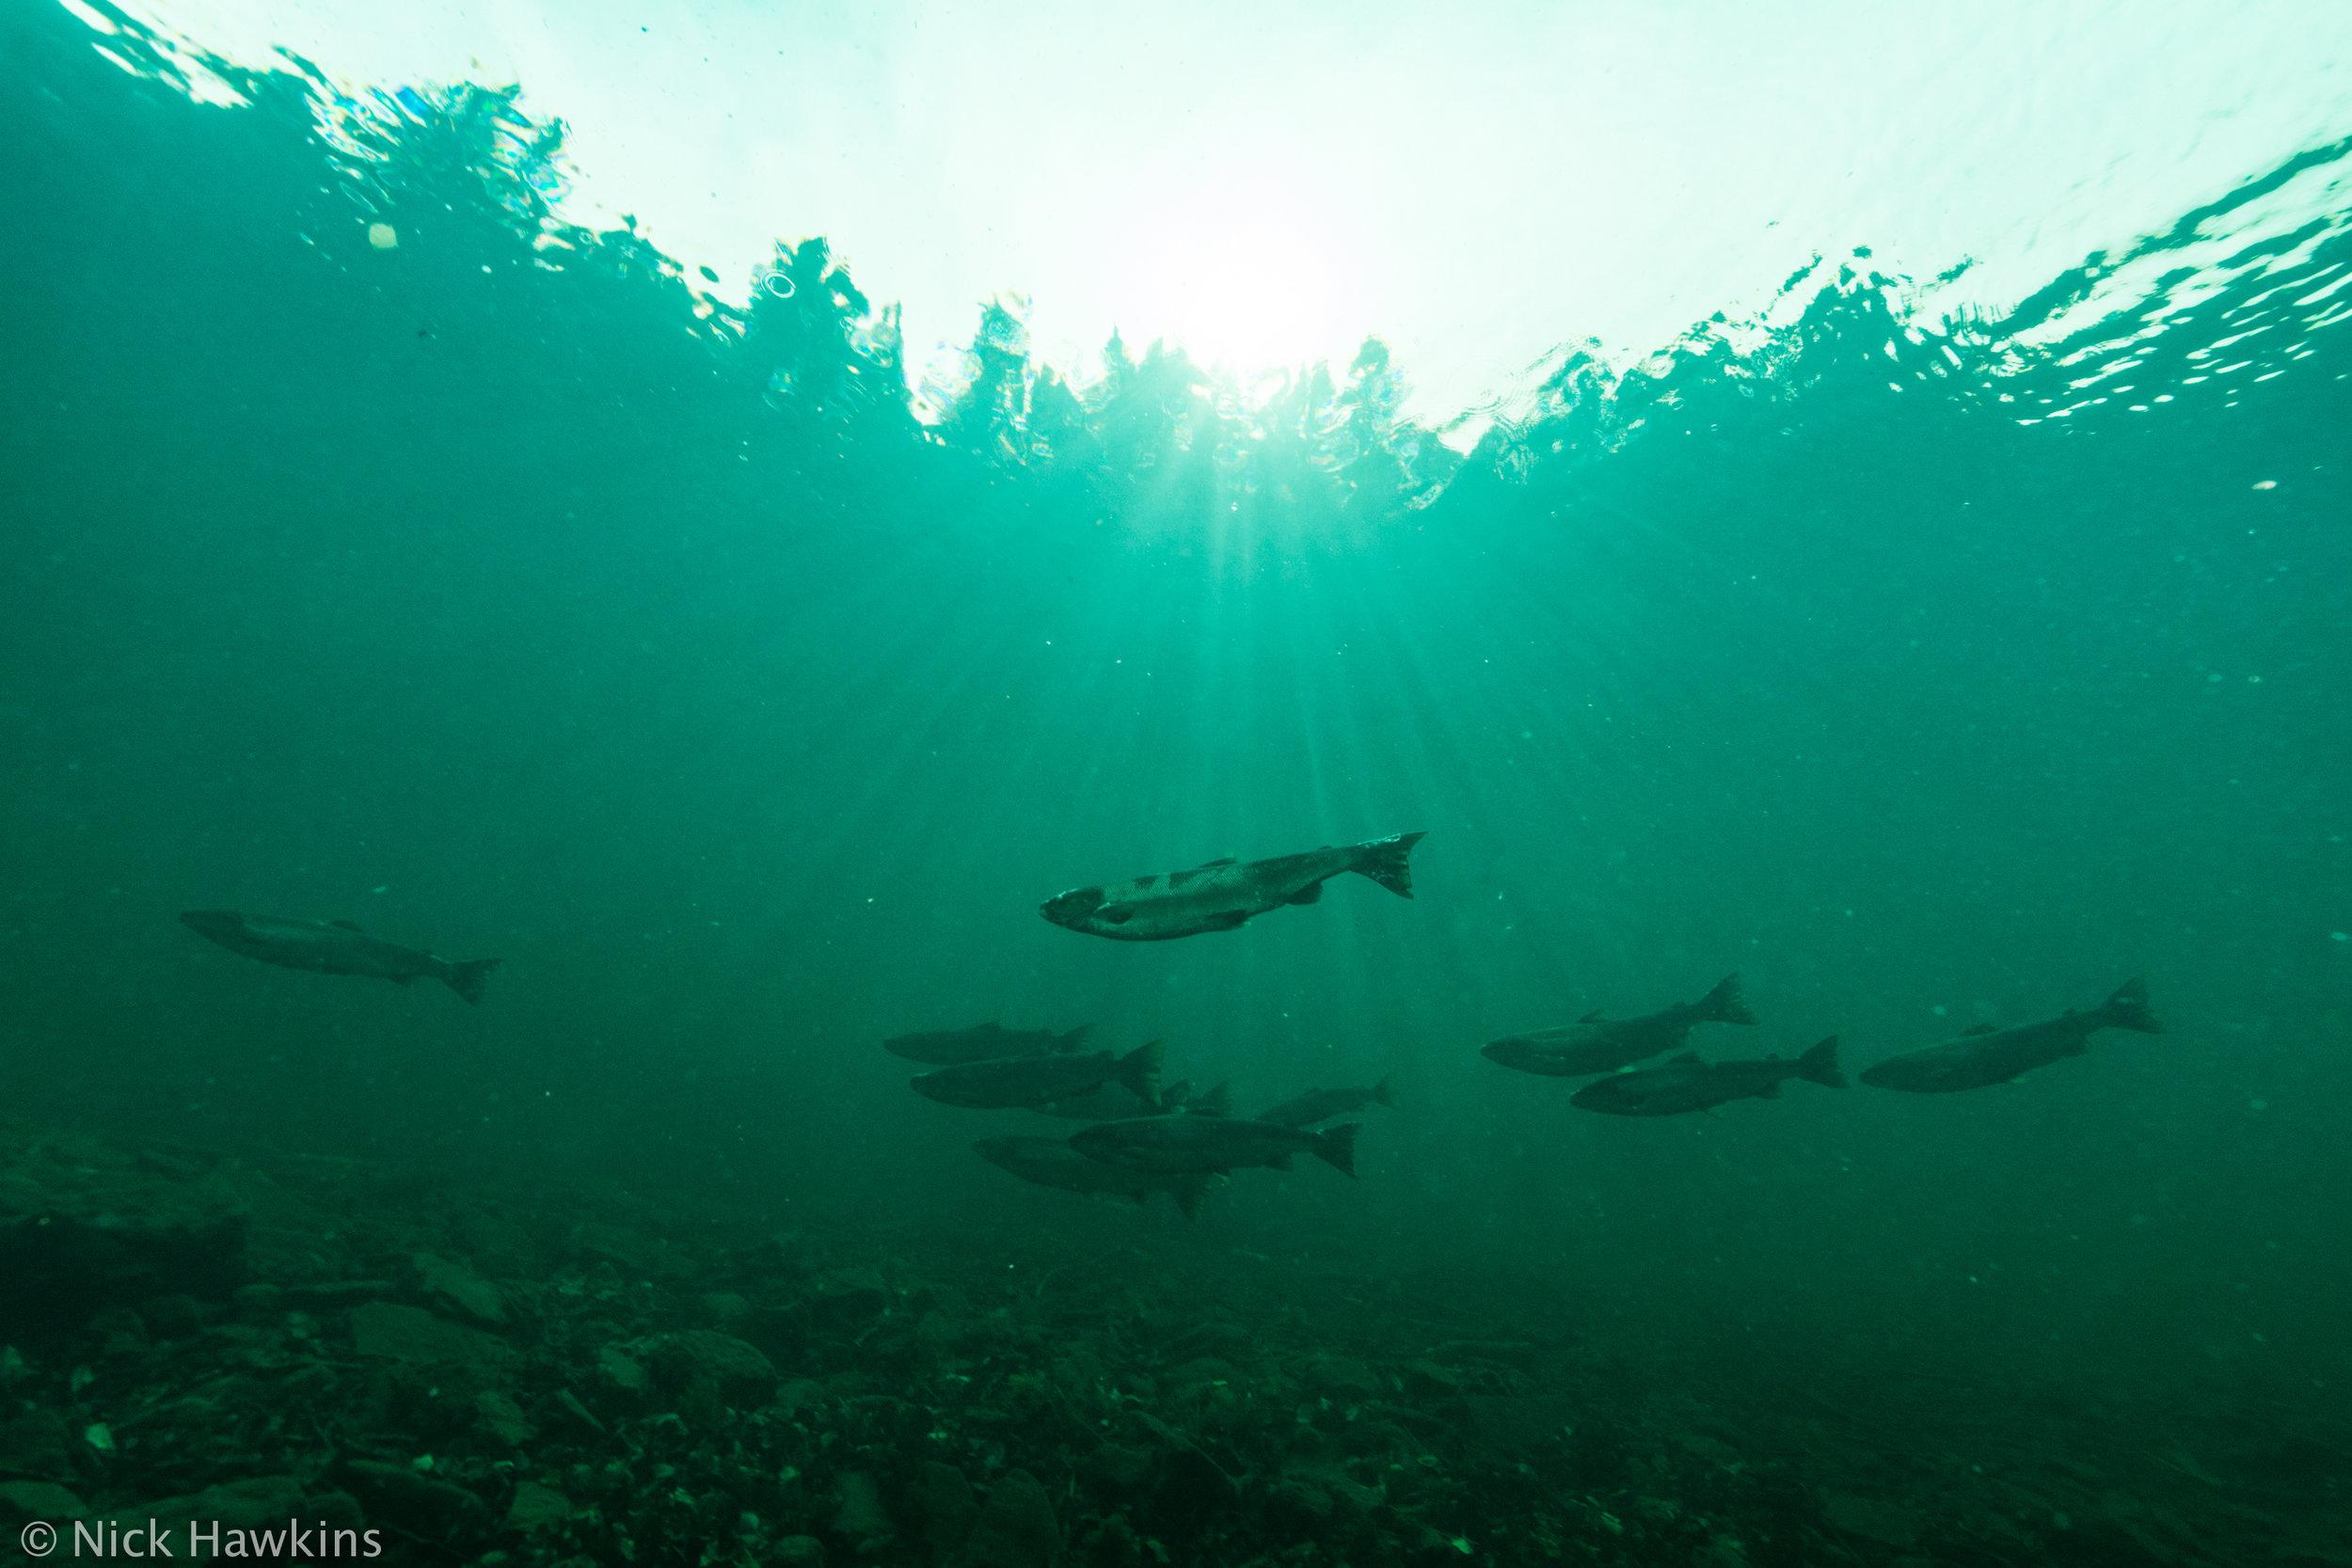 Gaspé-Saving-Salmon-Nick-Hawkins-2770.jpg